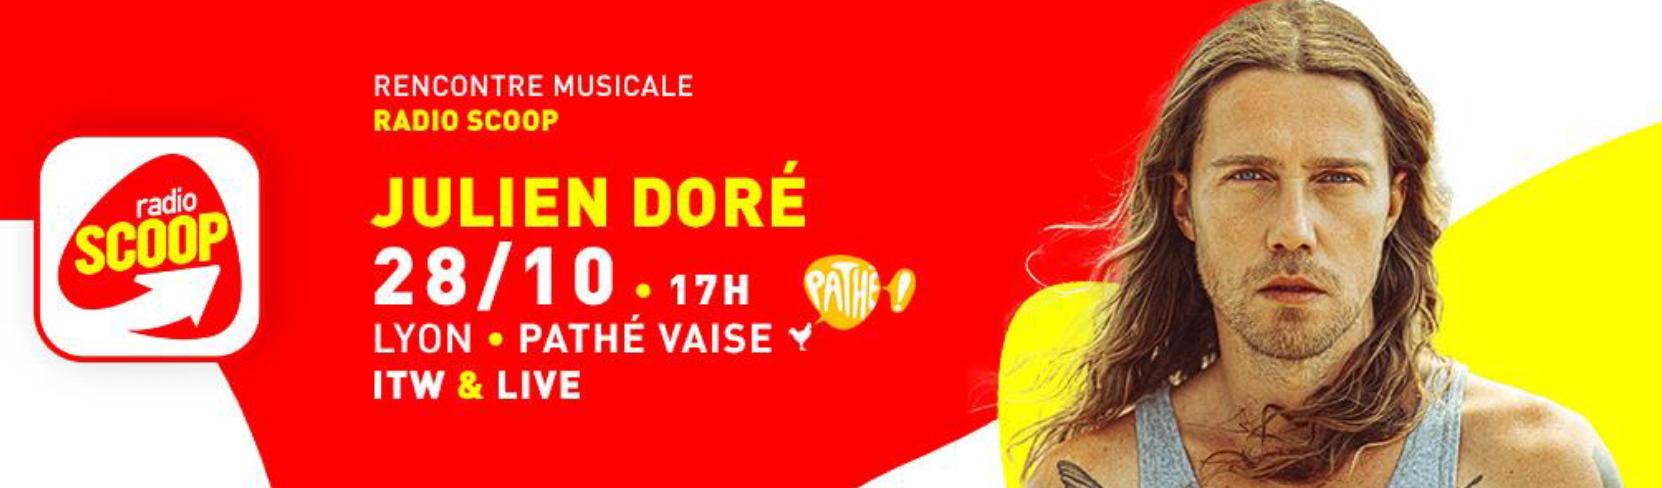 Radio Scoop reçoit Julien Doré